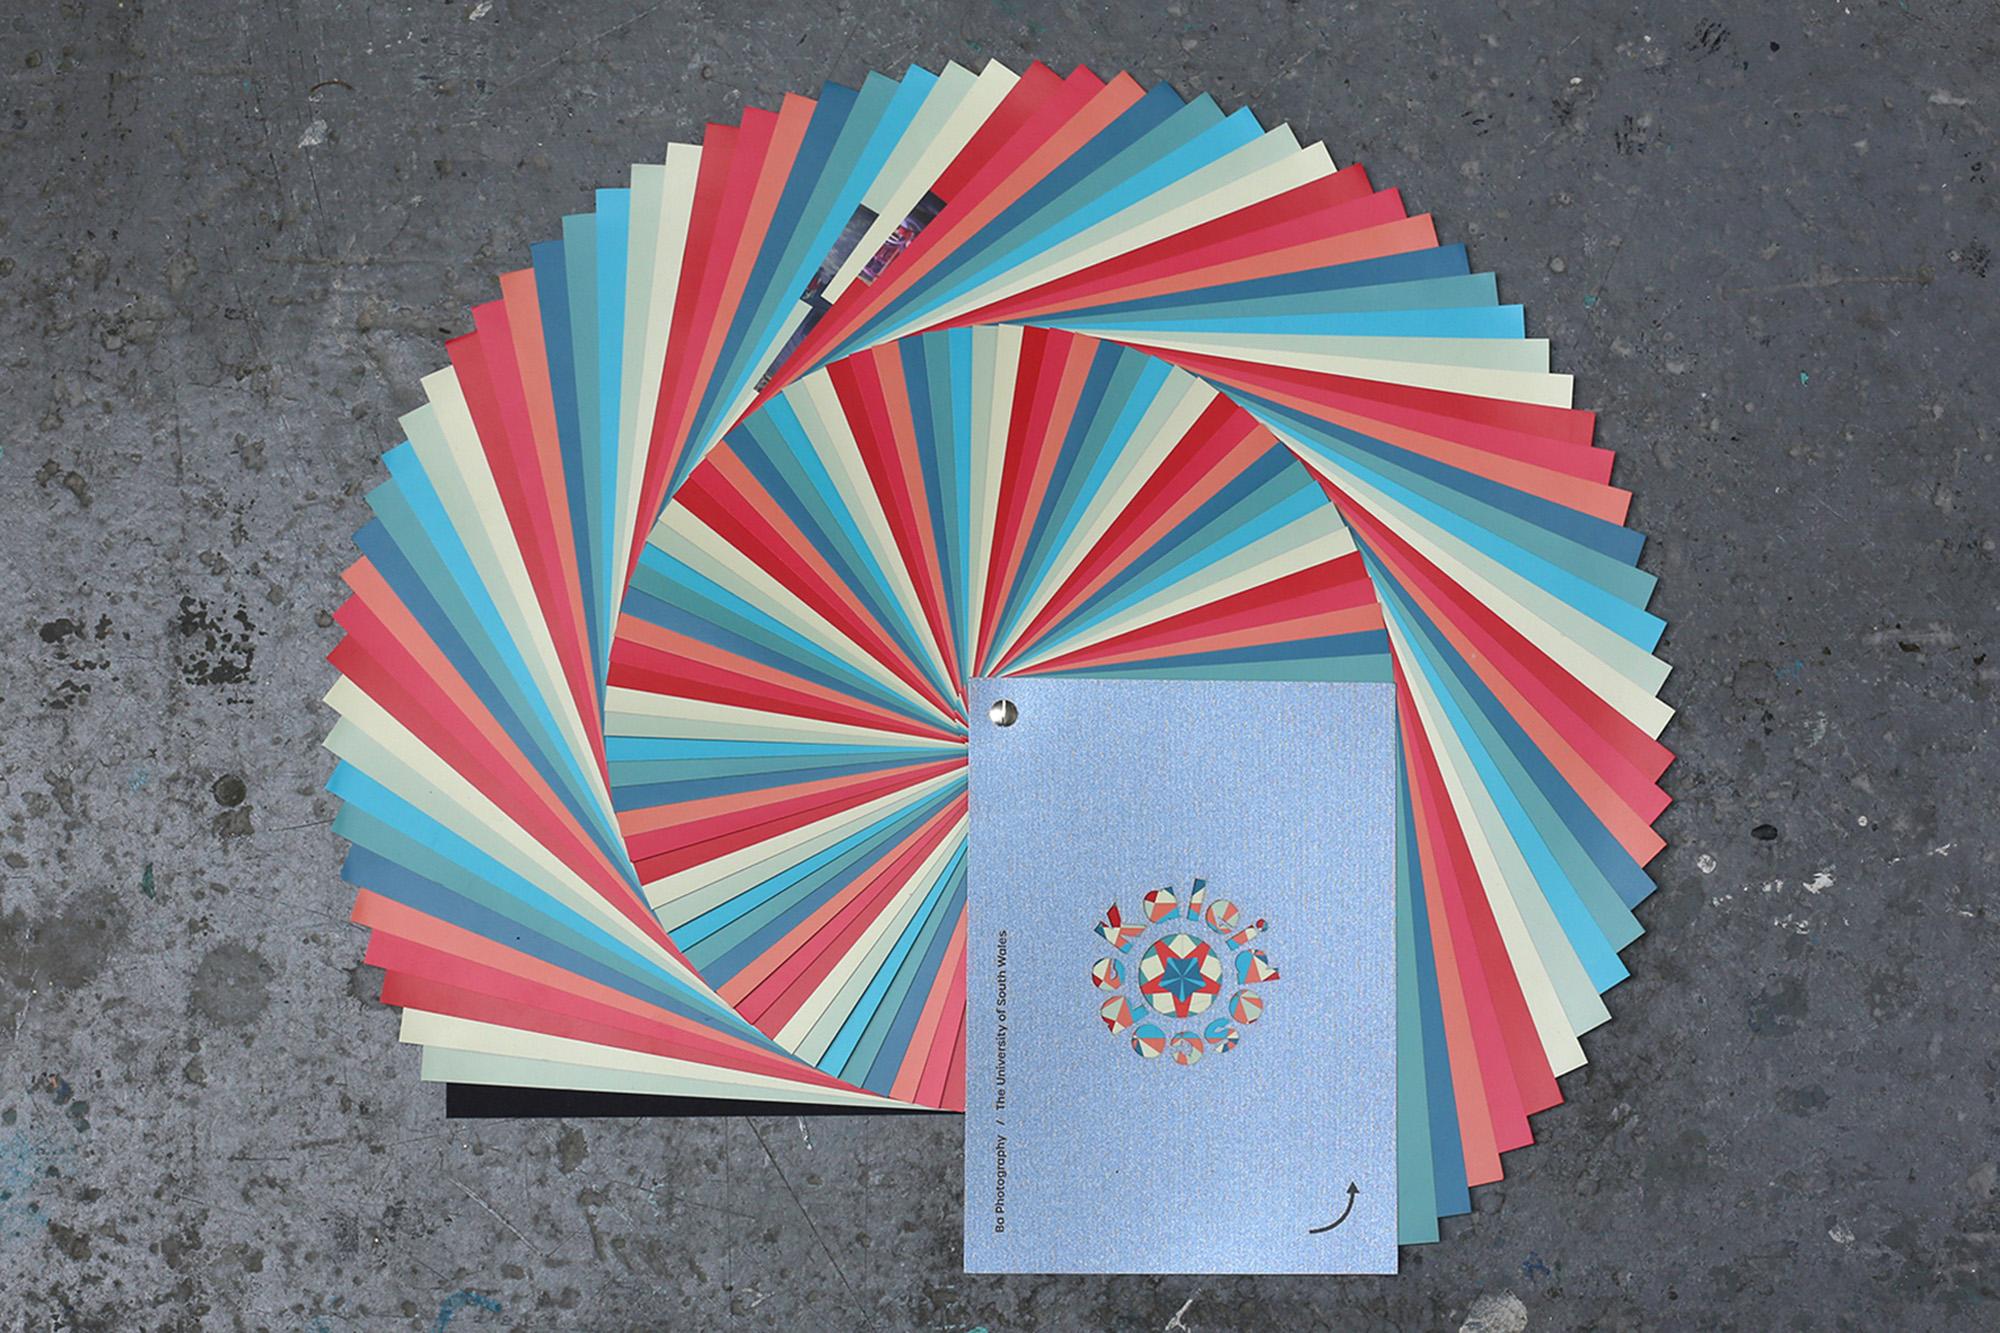 Kaleidoscope-I